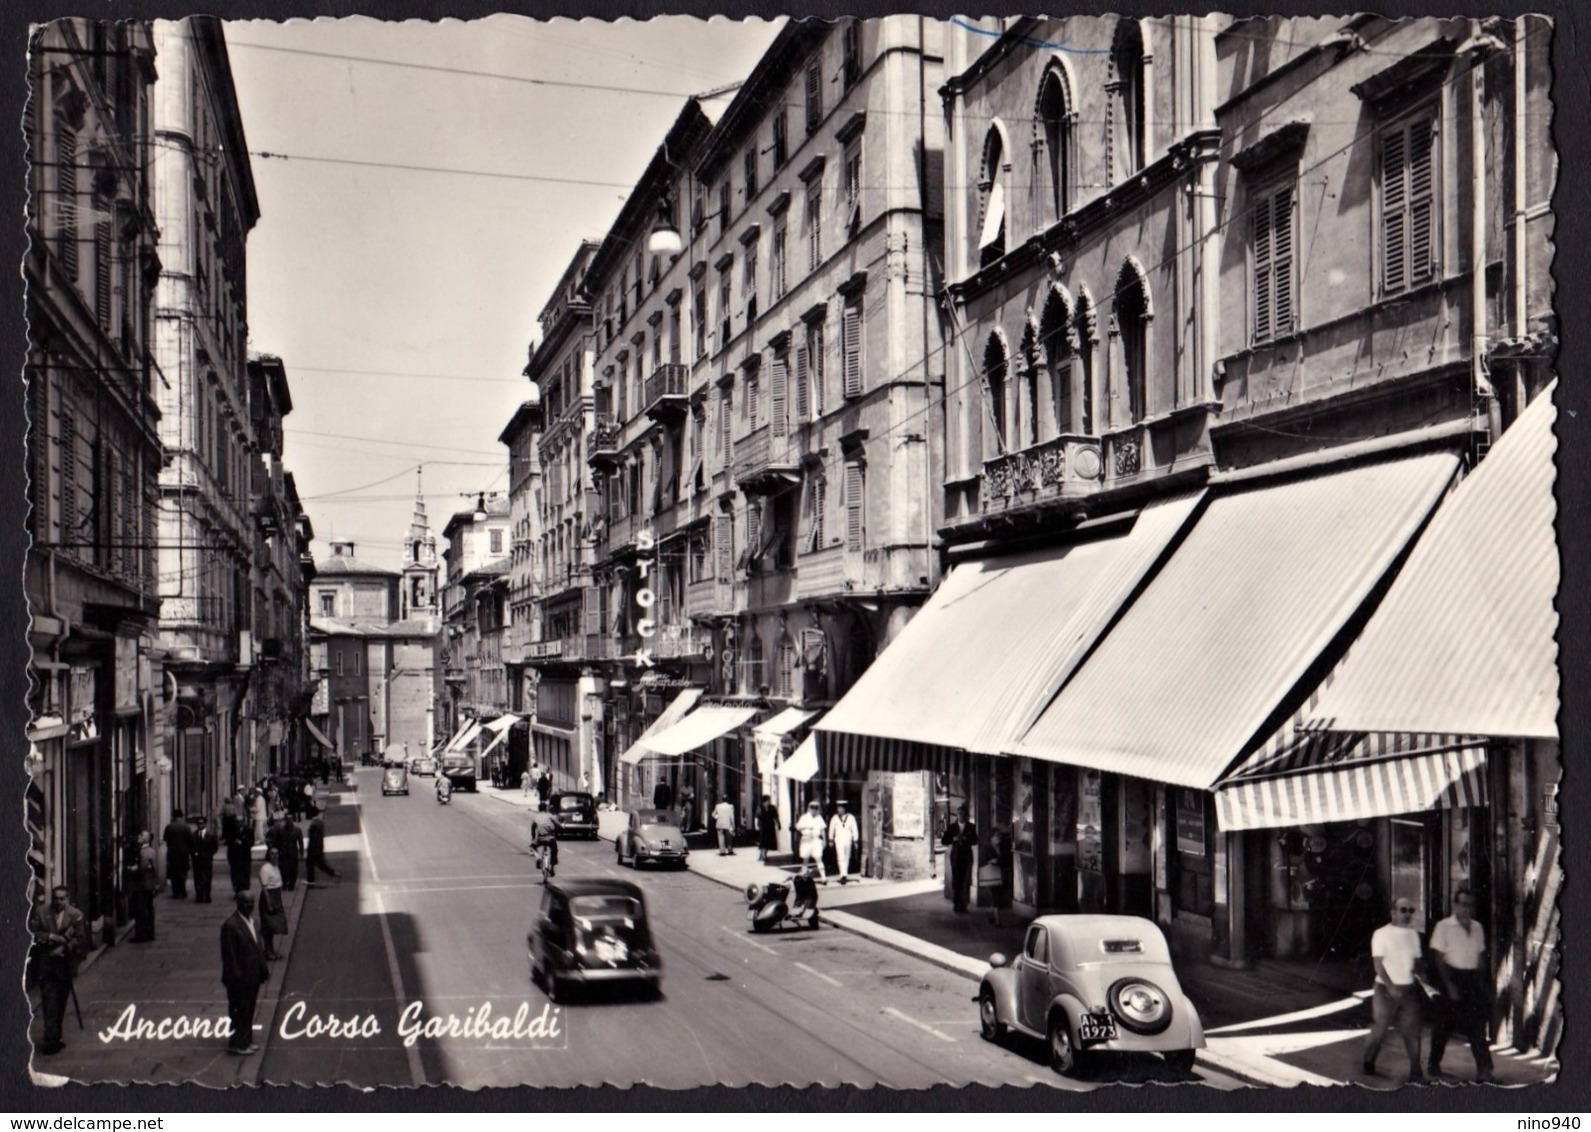 ANCONA - Corso Garibaldi - F/G - V: 1957 - Animata-auto - Ancona